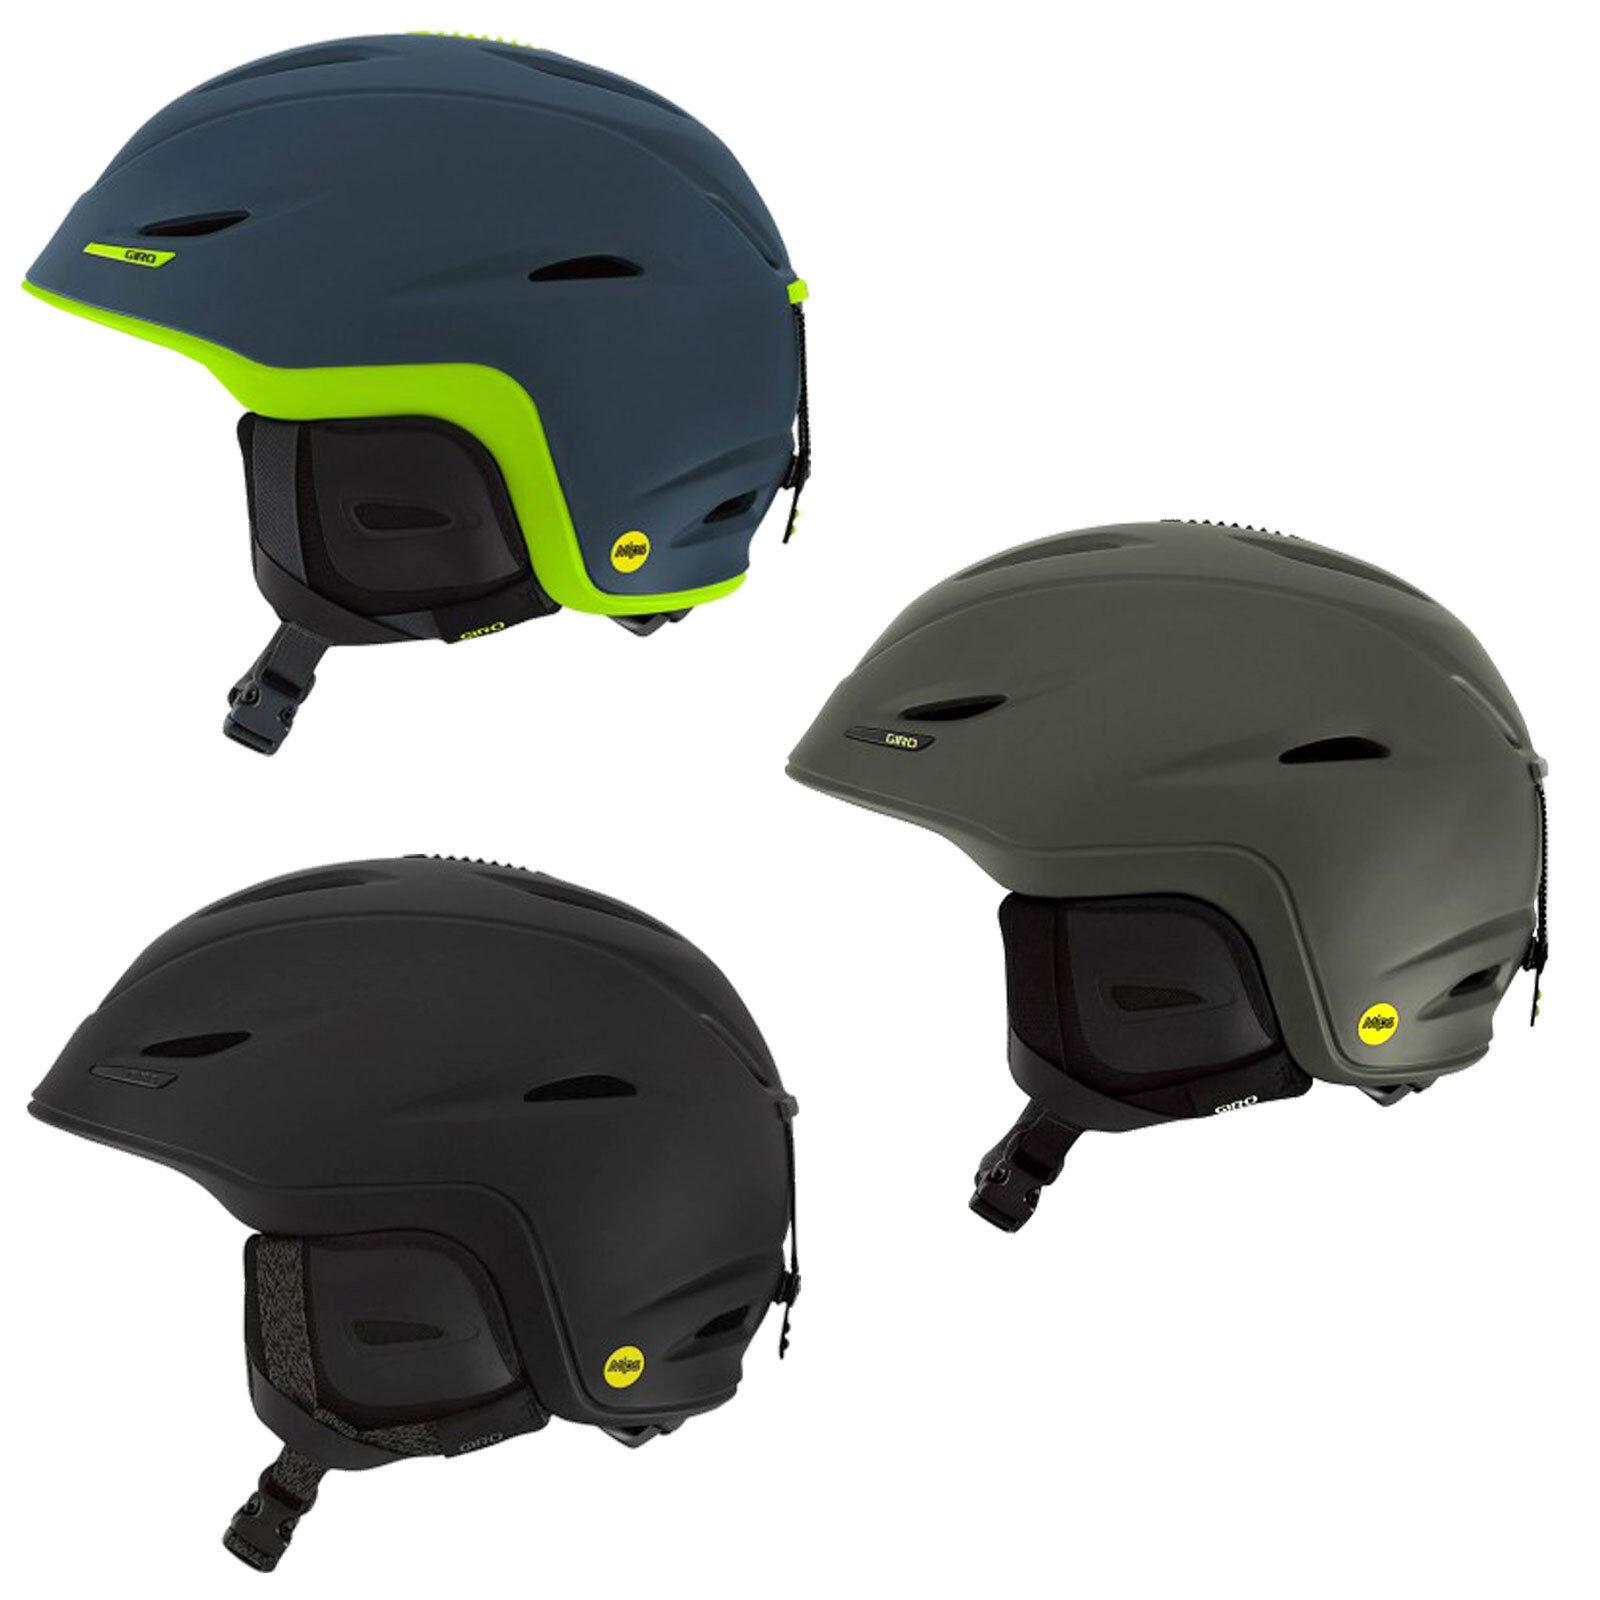 Giro Unione MIPS Casco da uomoSnowboard Casco funzione casco casco casco sport invernali